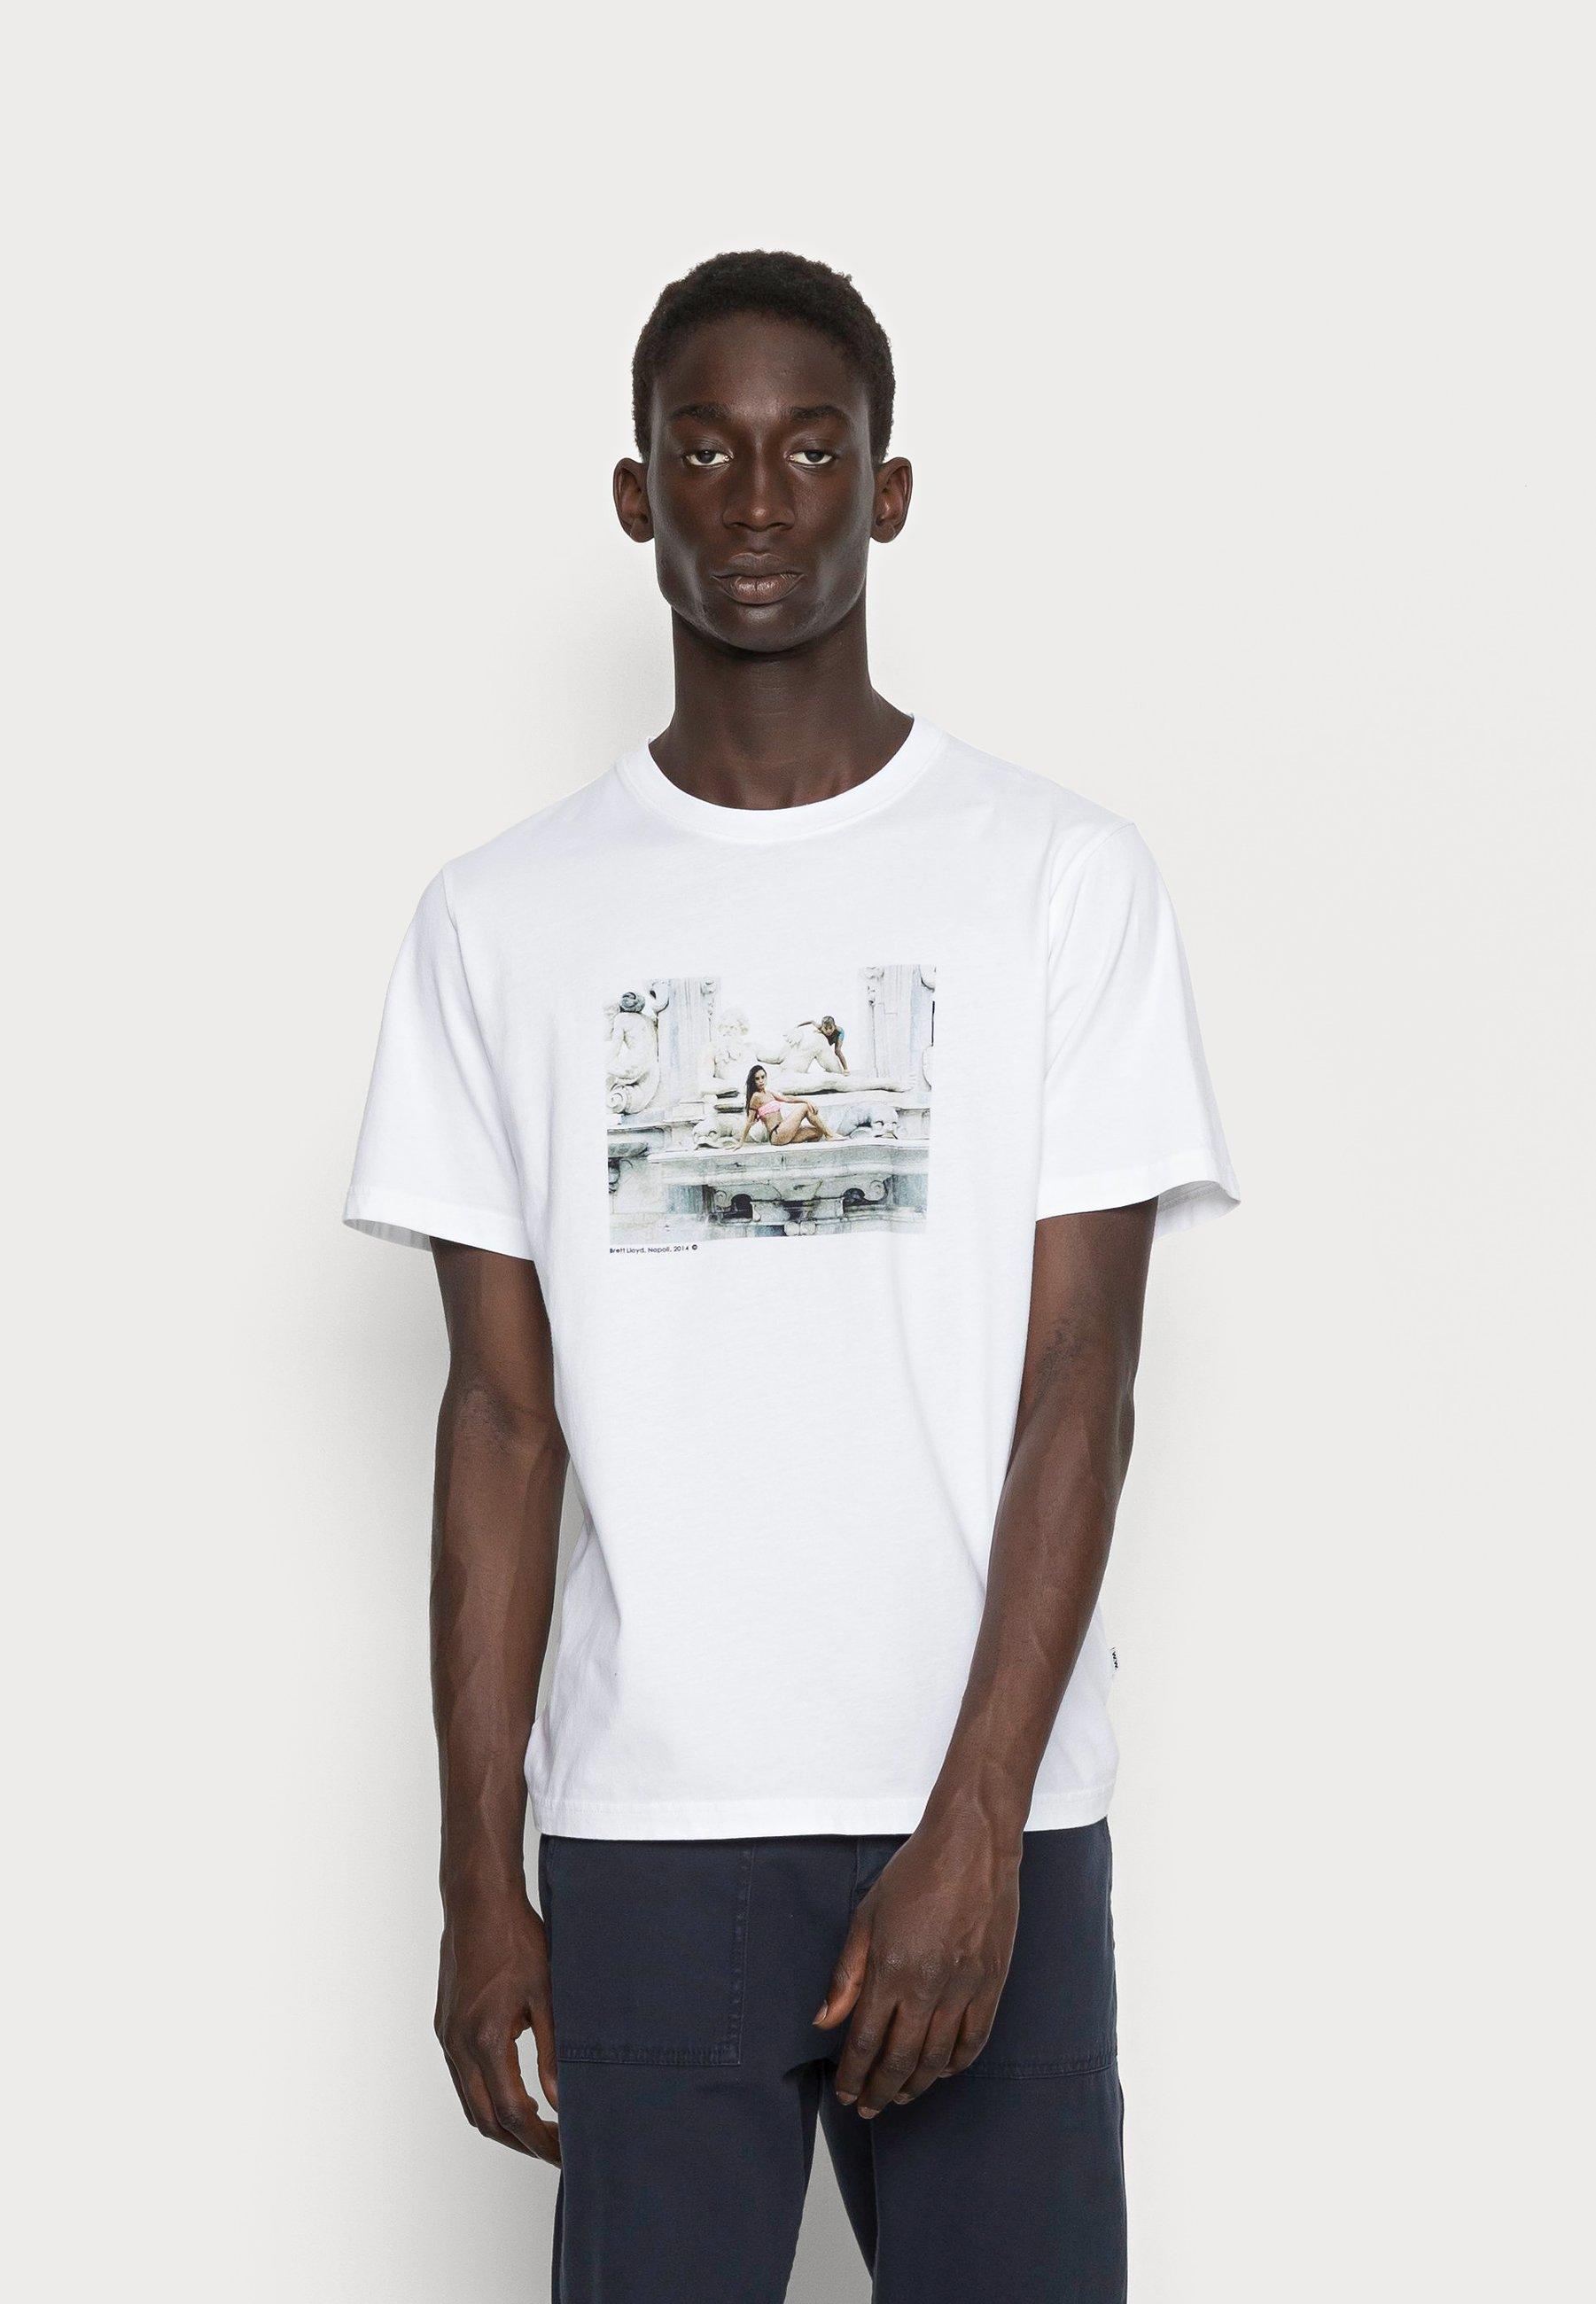 Homme SAMI BRETT LLOYD RAGAZZA - T-shirt imprimé